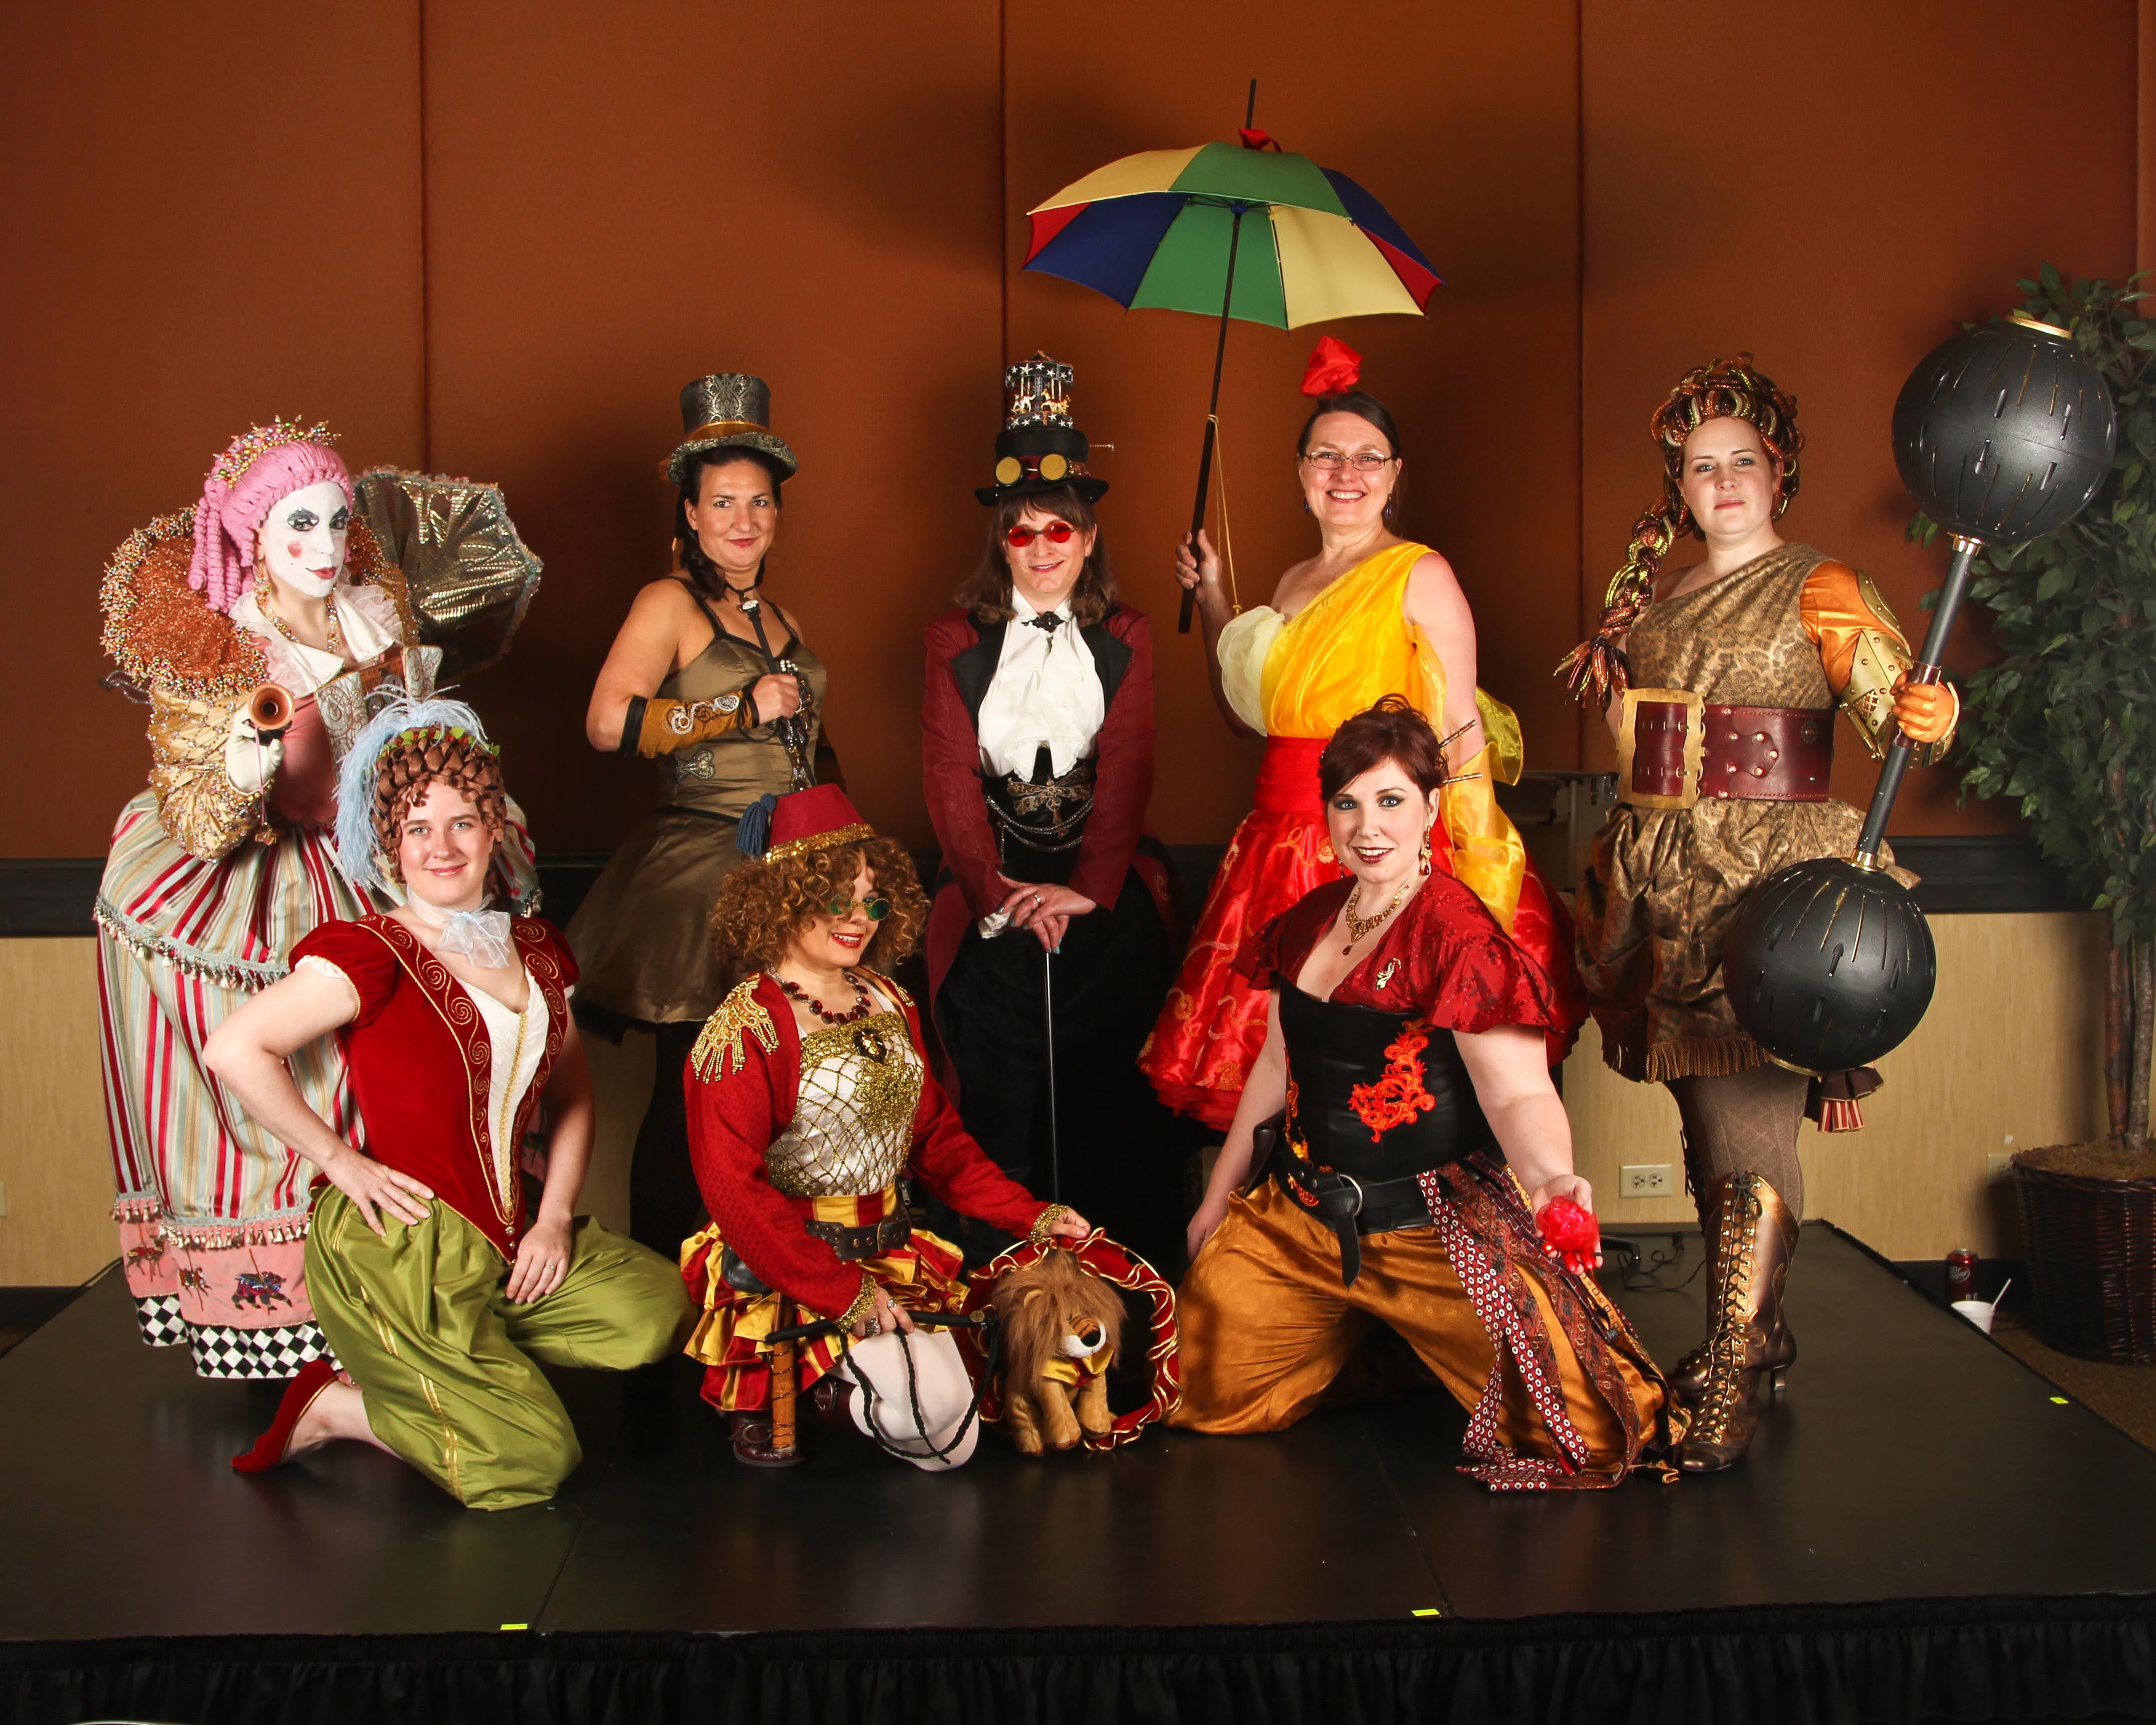 Steampunk Circus at Costume Con 31 | Steampunk | Pinterest ...